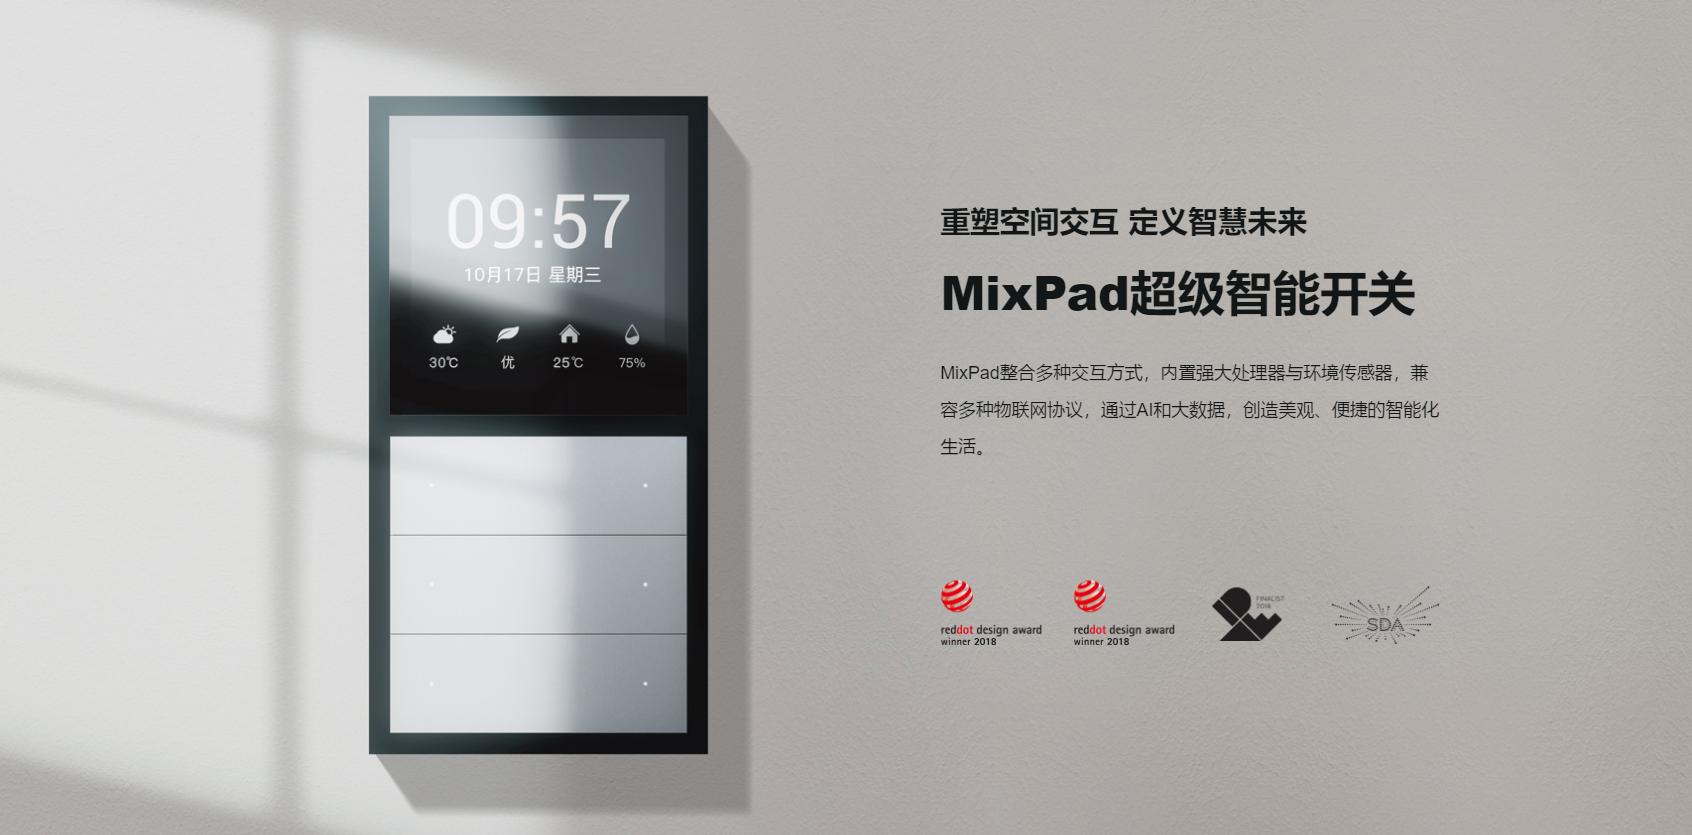 MixPad 超级智能开关